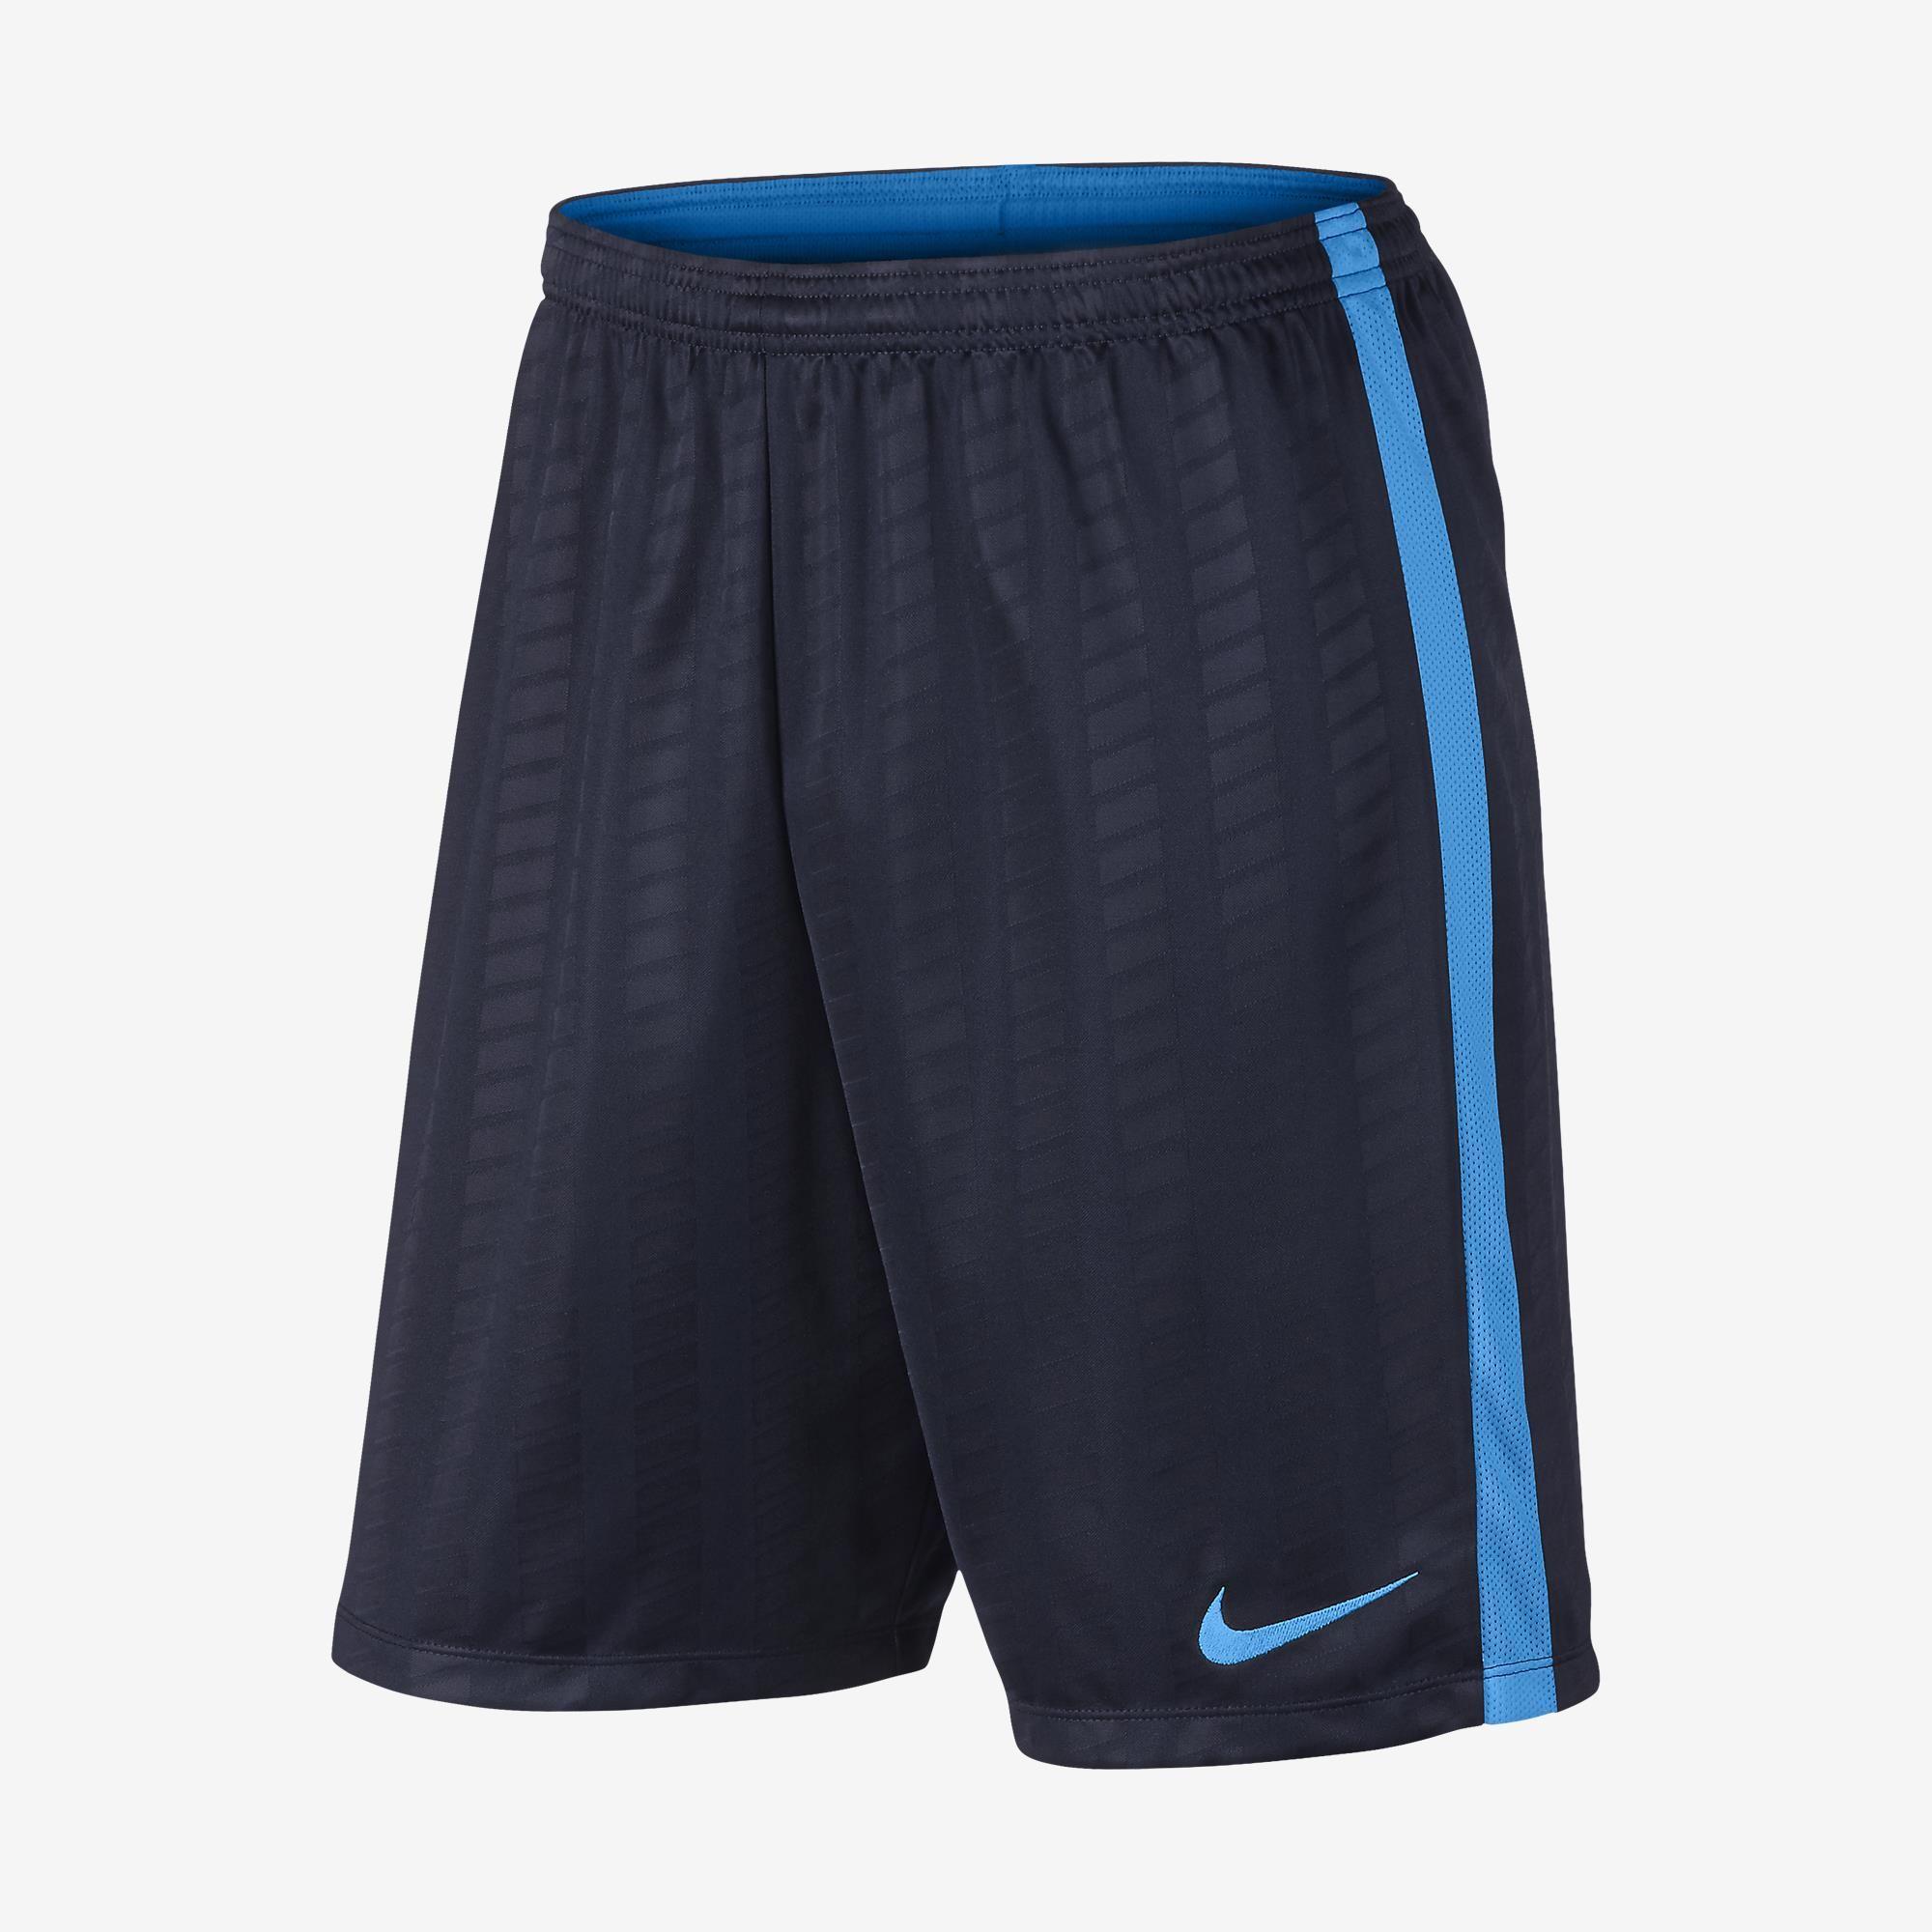 Bermuda Nike Academy Jacquard -  Masculino - Marinho